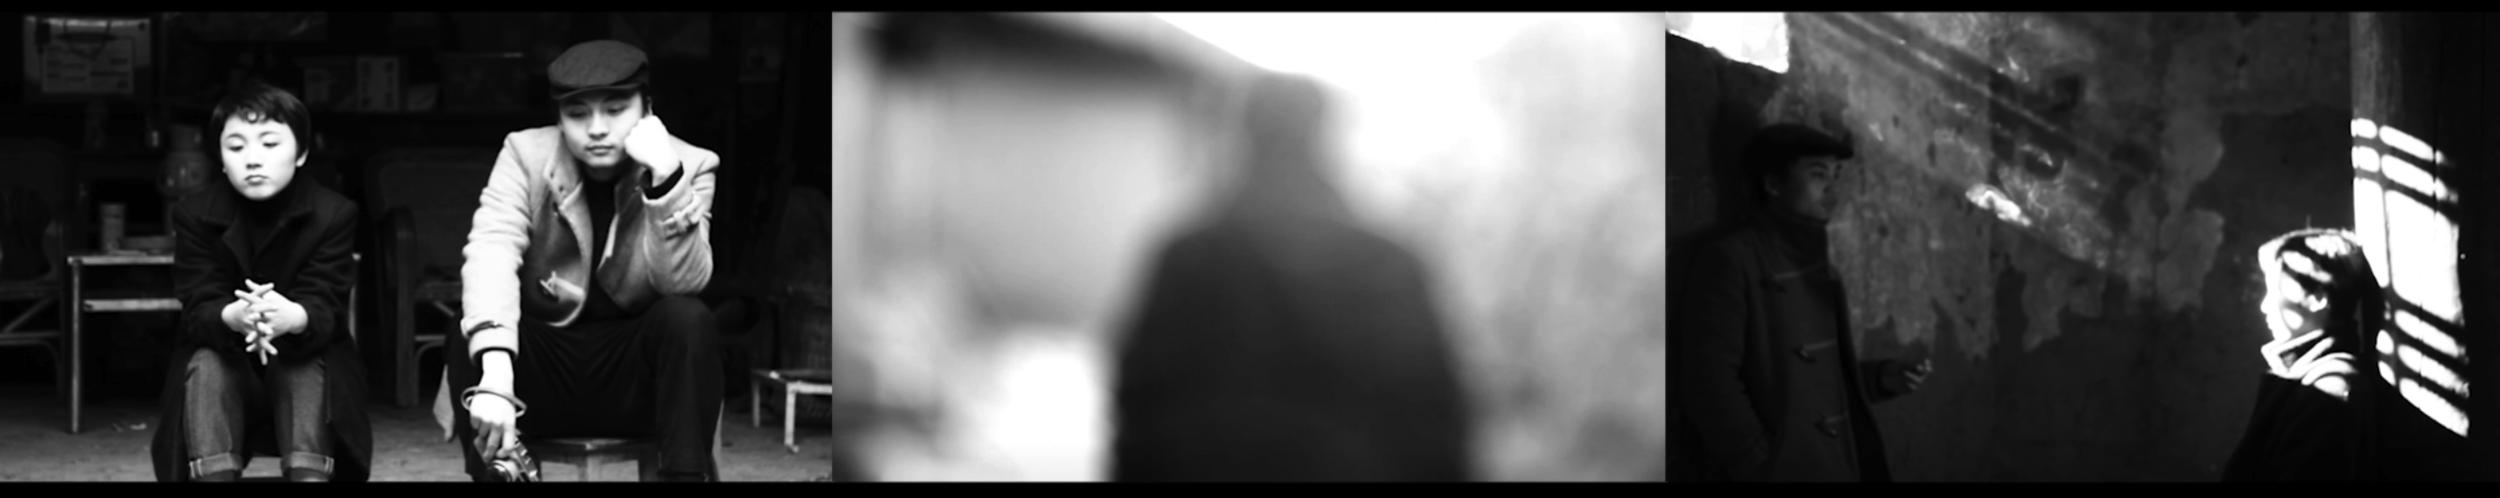 袁可如 Yuan Keru   云龙绮梦 A Salted Entounter 三屏幕影像装置Three-screen video installation  时长 Duration 15m14s   5+2AP   2014.png